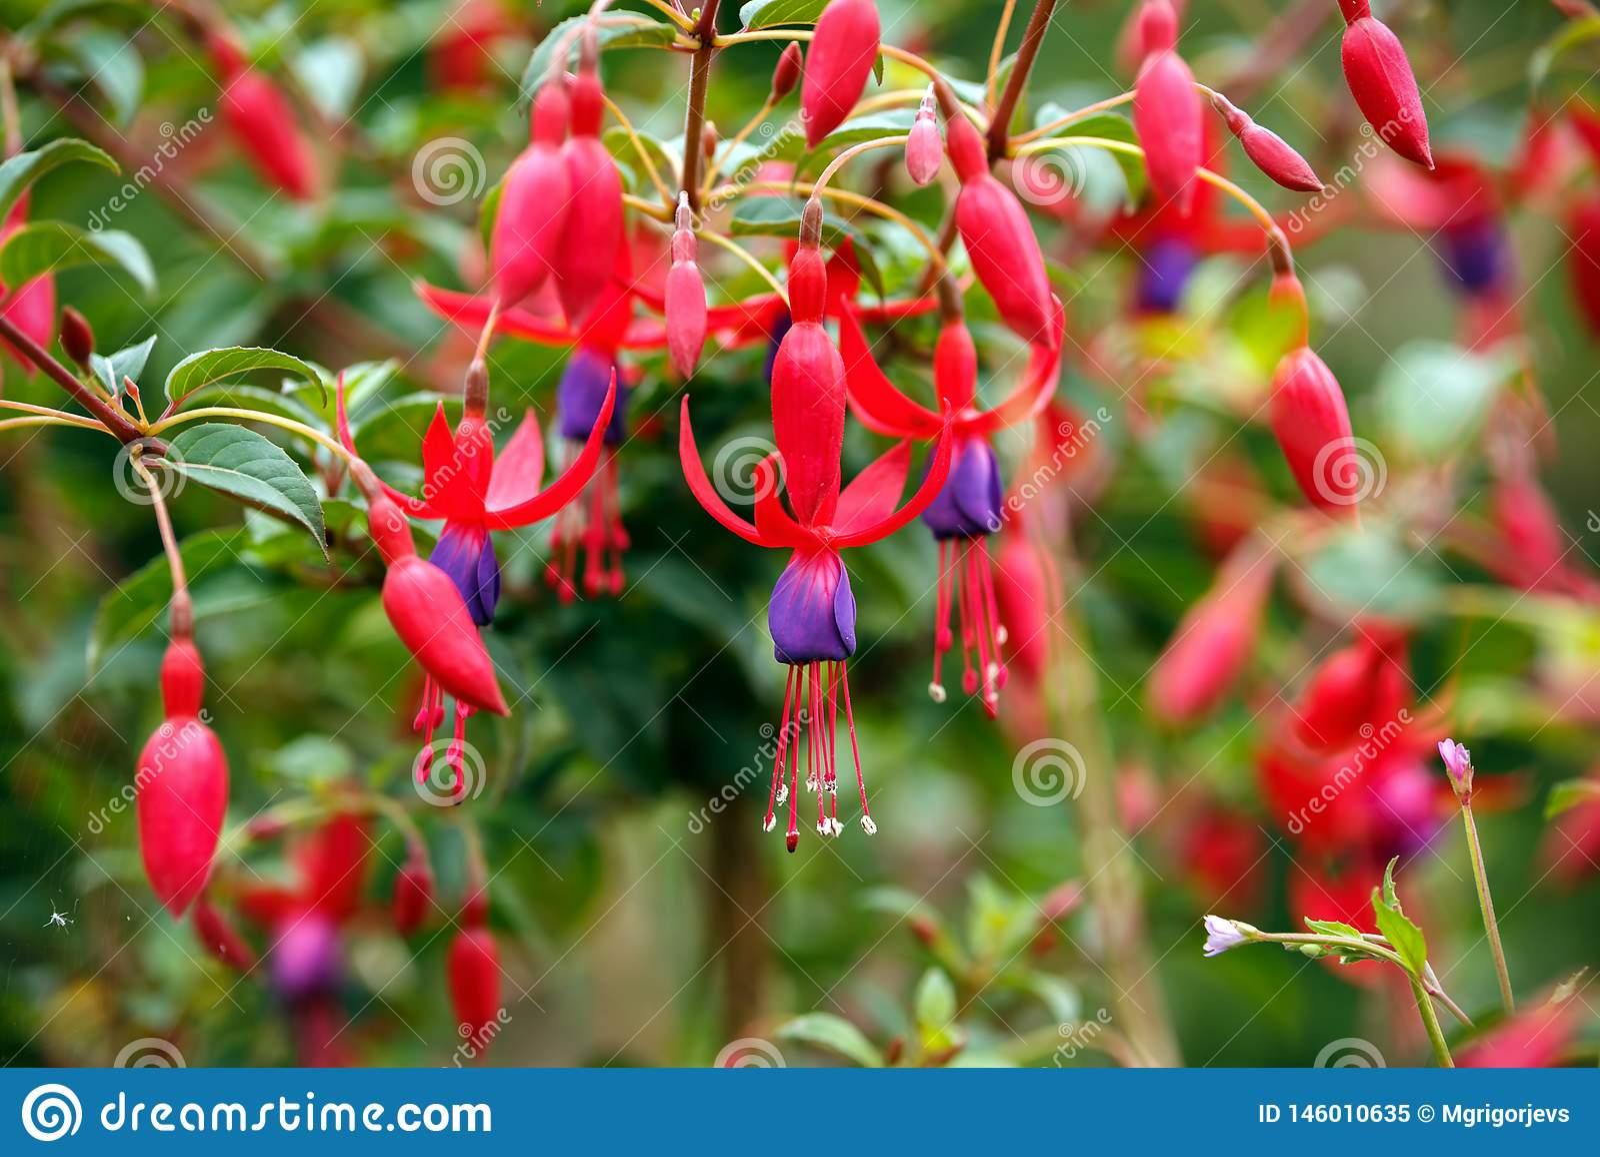 Fuchsiablomningcloseup i hem- grön trädgård